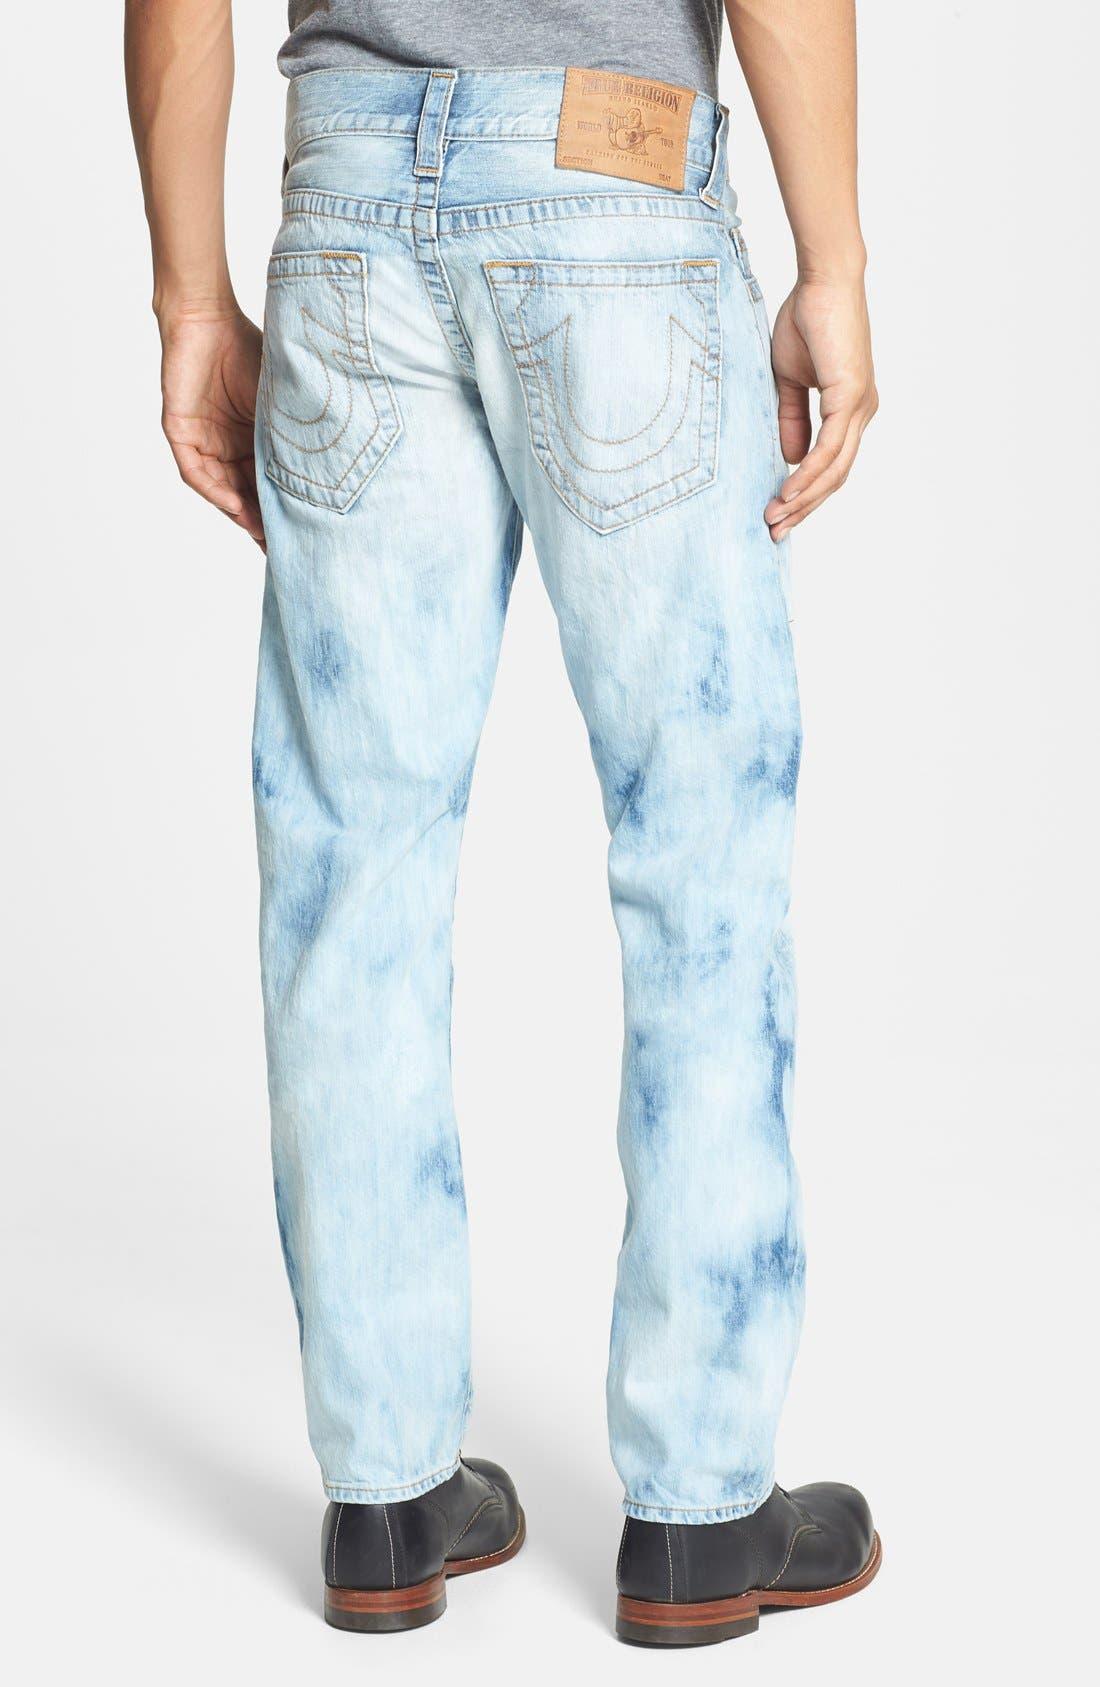 Alternate Image 1 Selected - True Religion Brand Jeans 'Geno' Straight Leg Jeans (YLL Antelope)